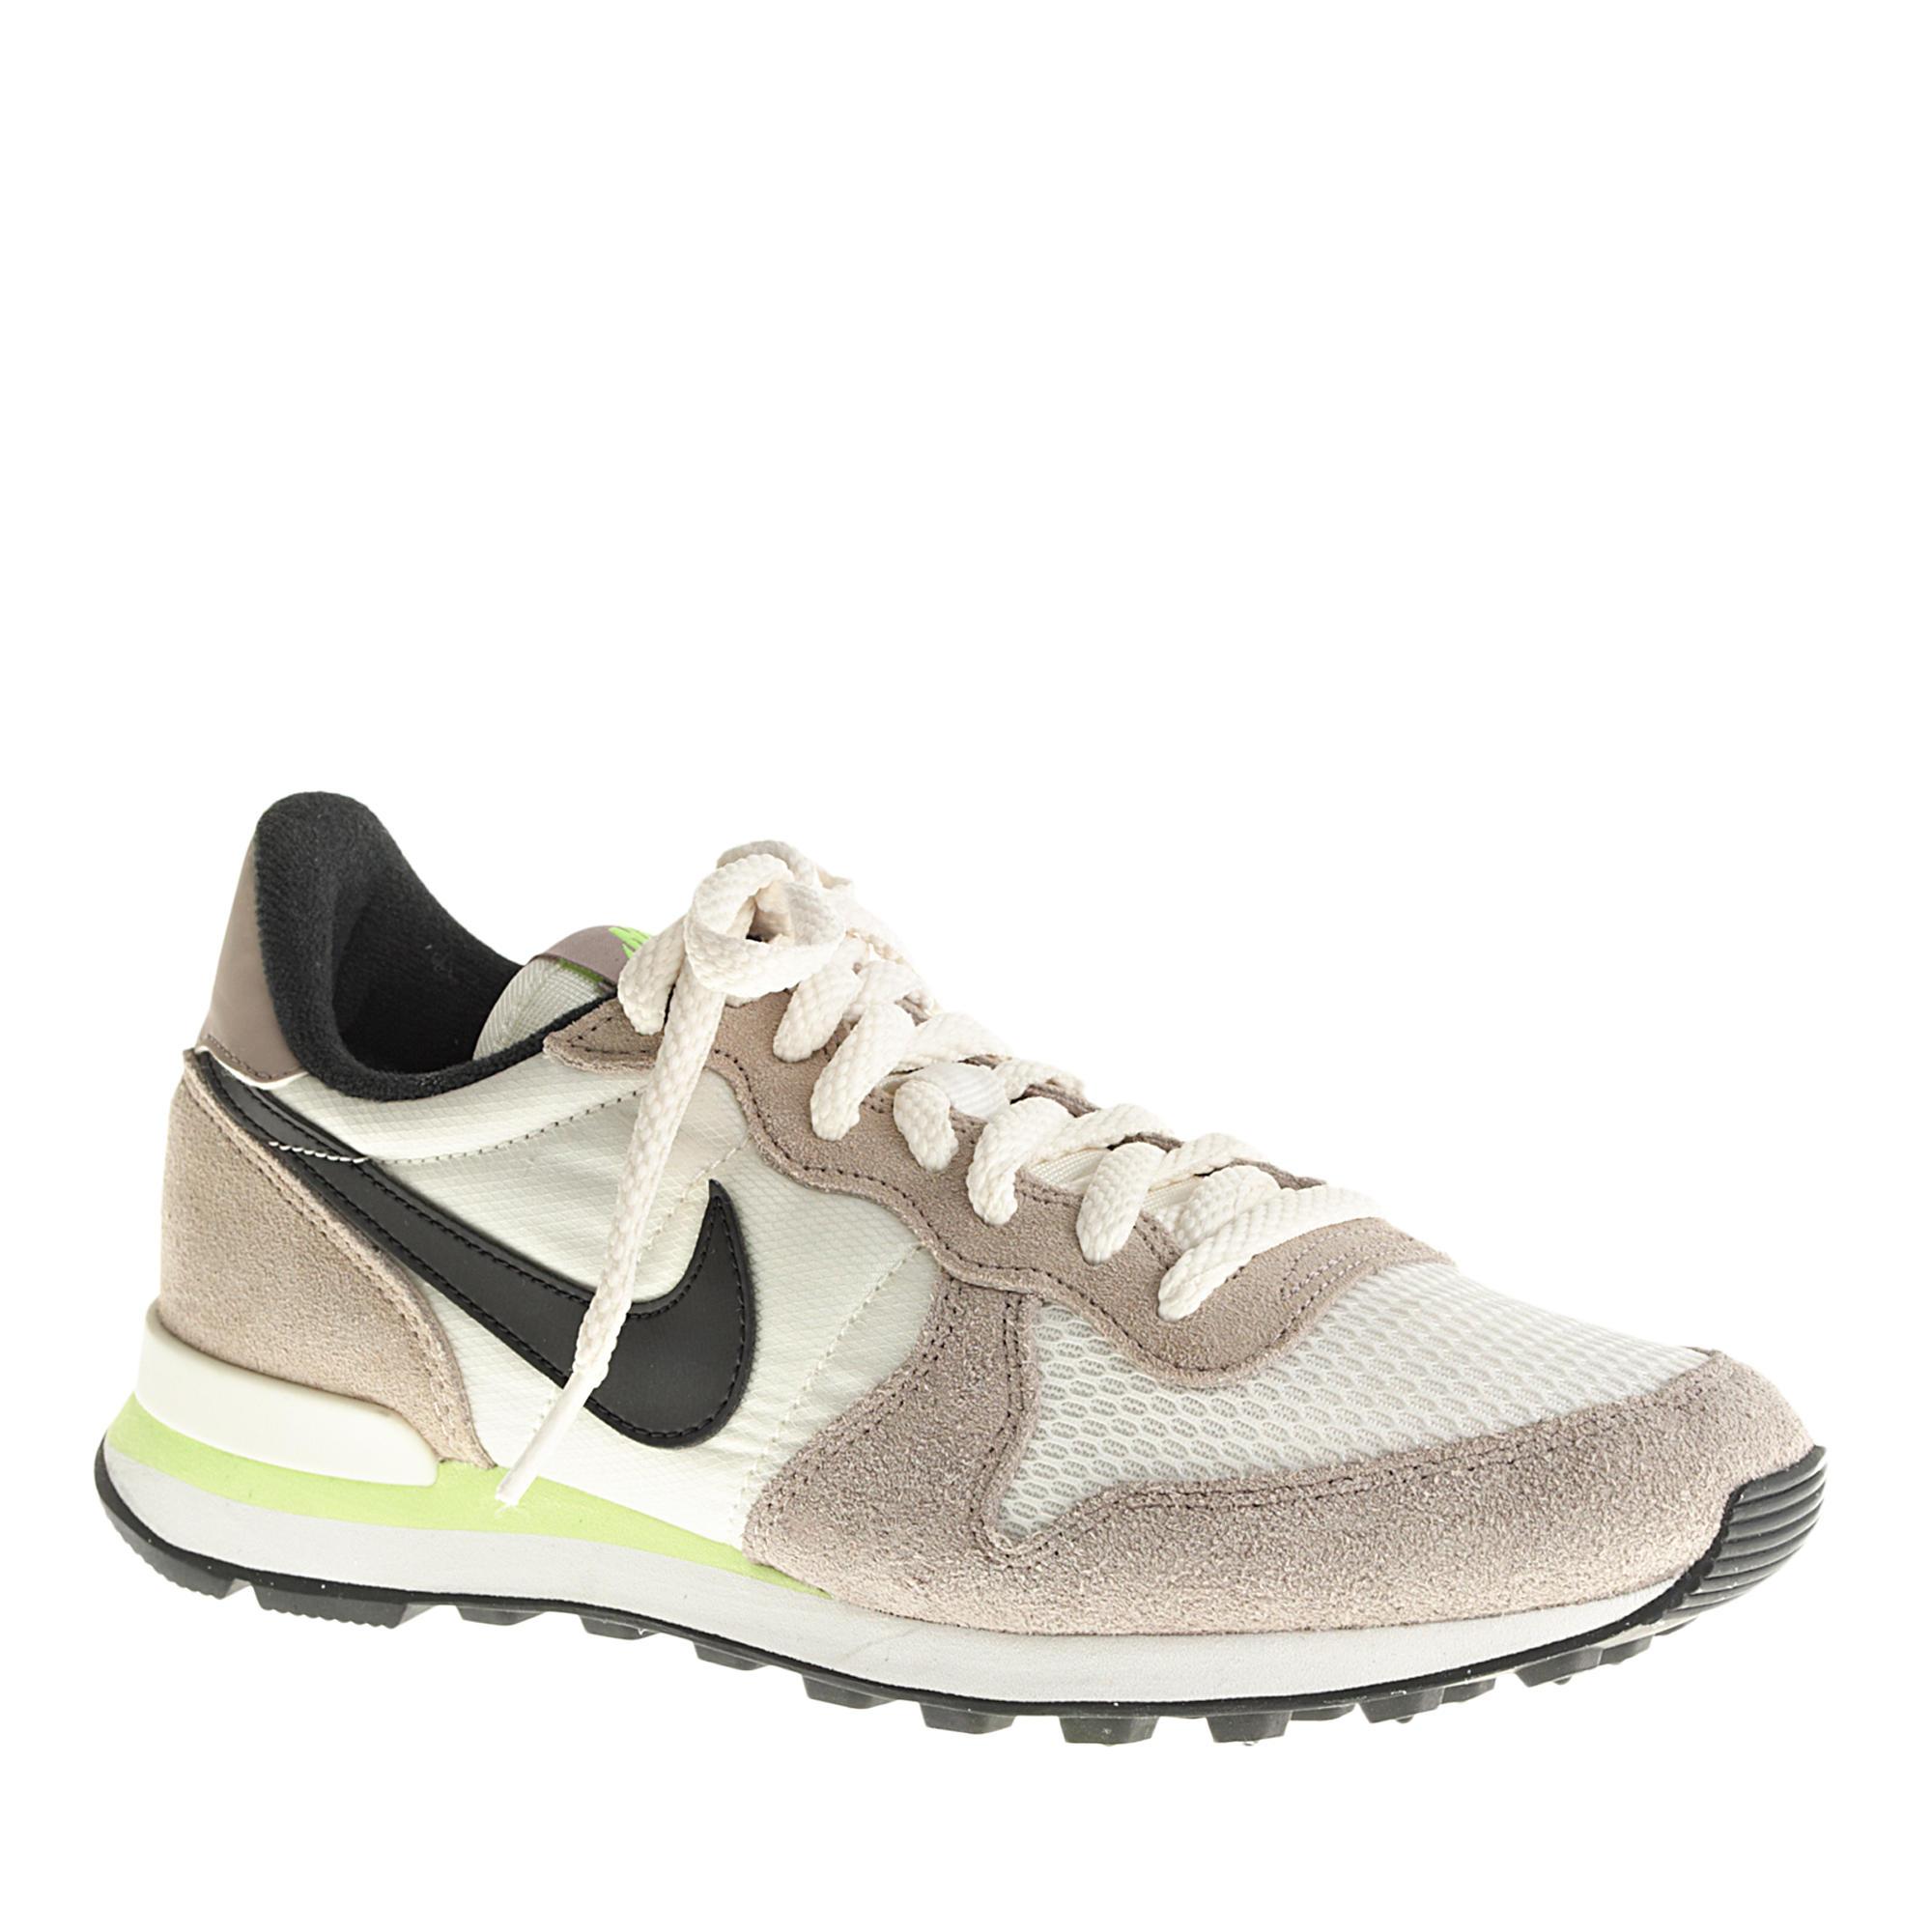 Lyst - J.Crew Women s Nike Internationalist Sneakers in Brown 7f1317885